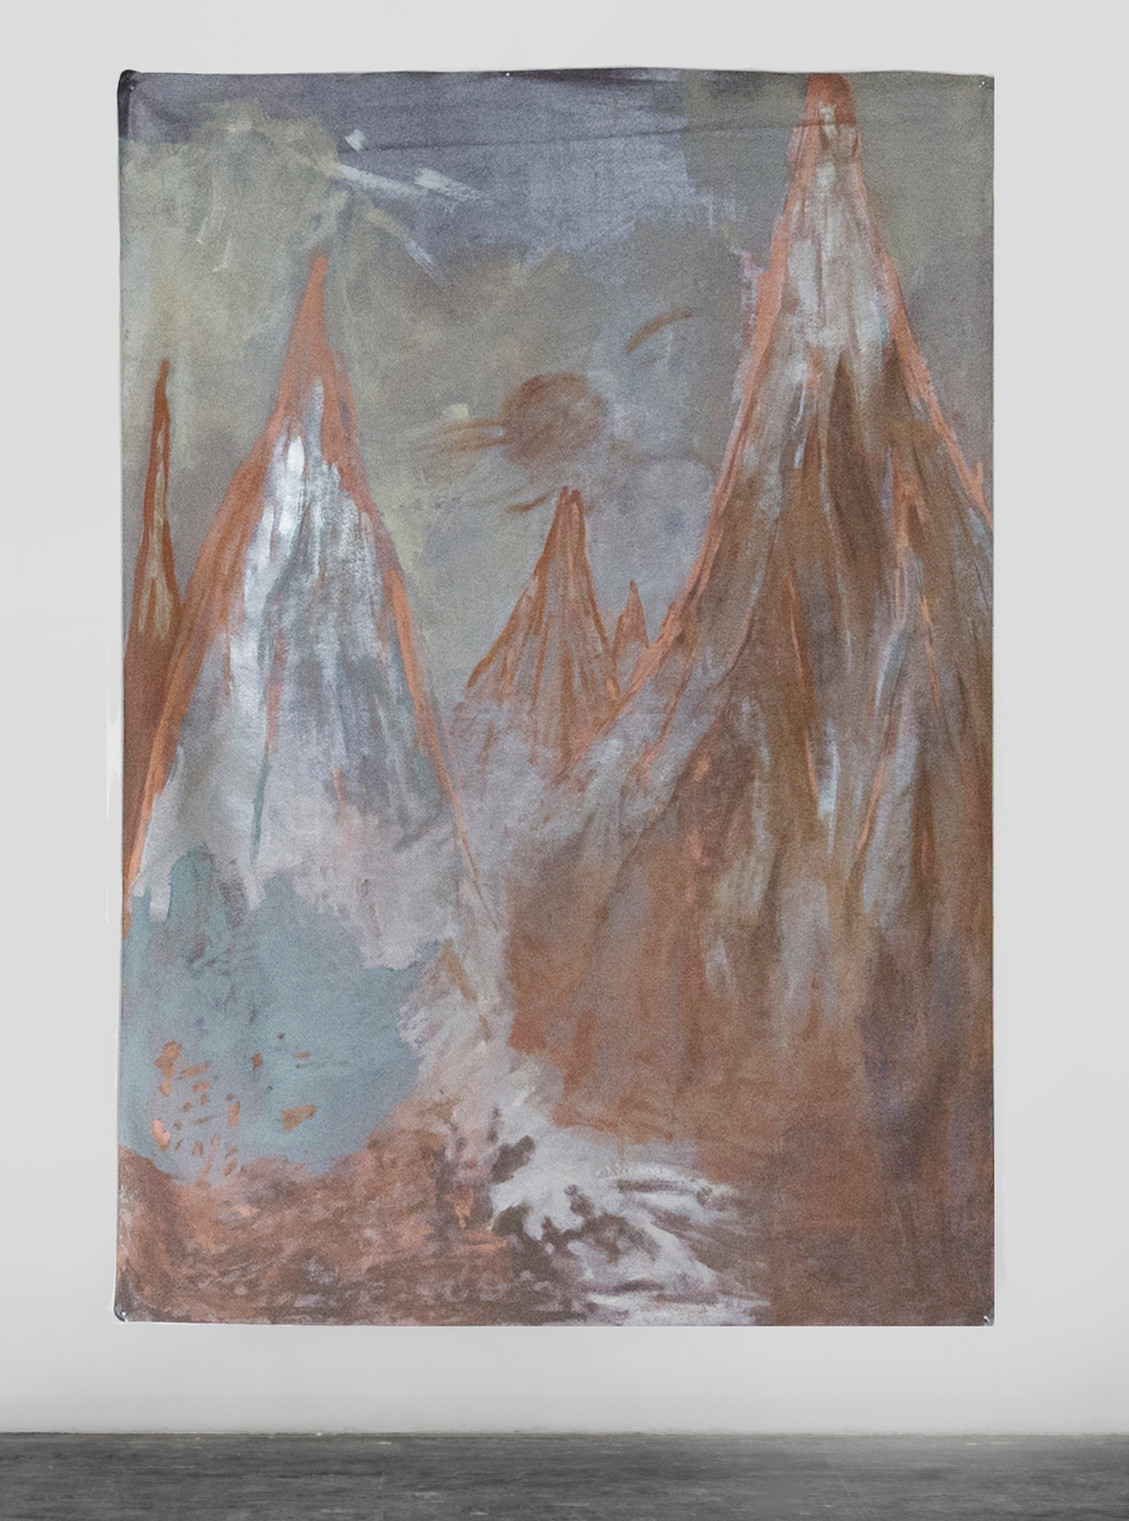 Eruption, 2018 | Synthetic Leather Enamel | 200 x 140 cm